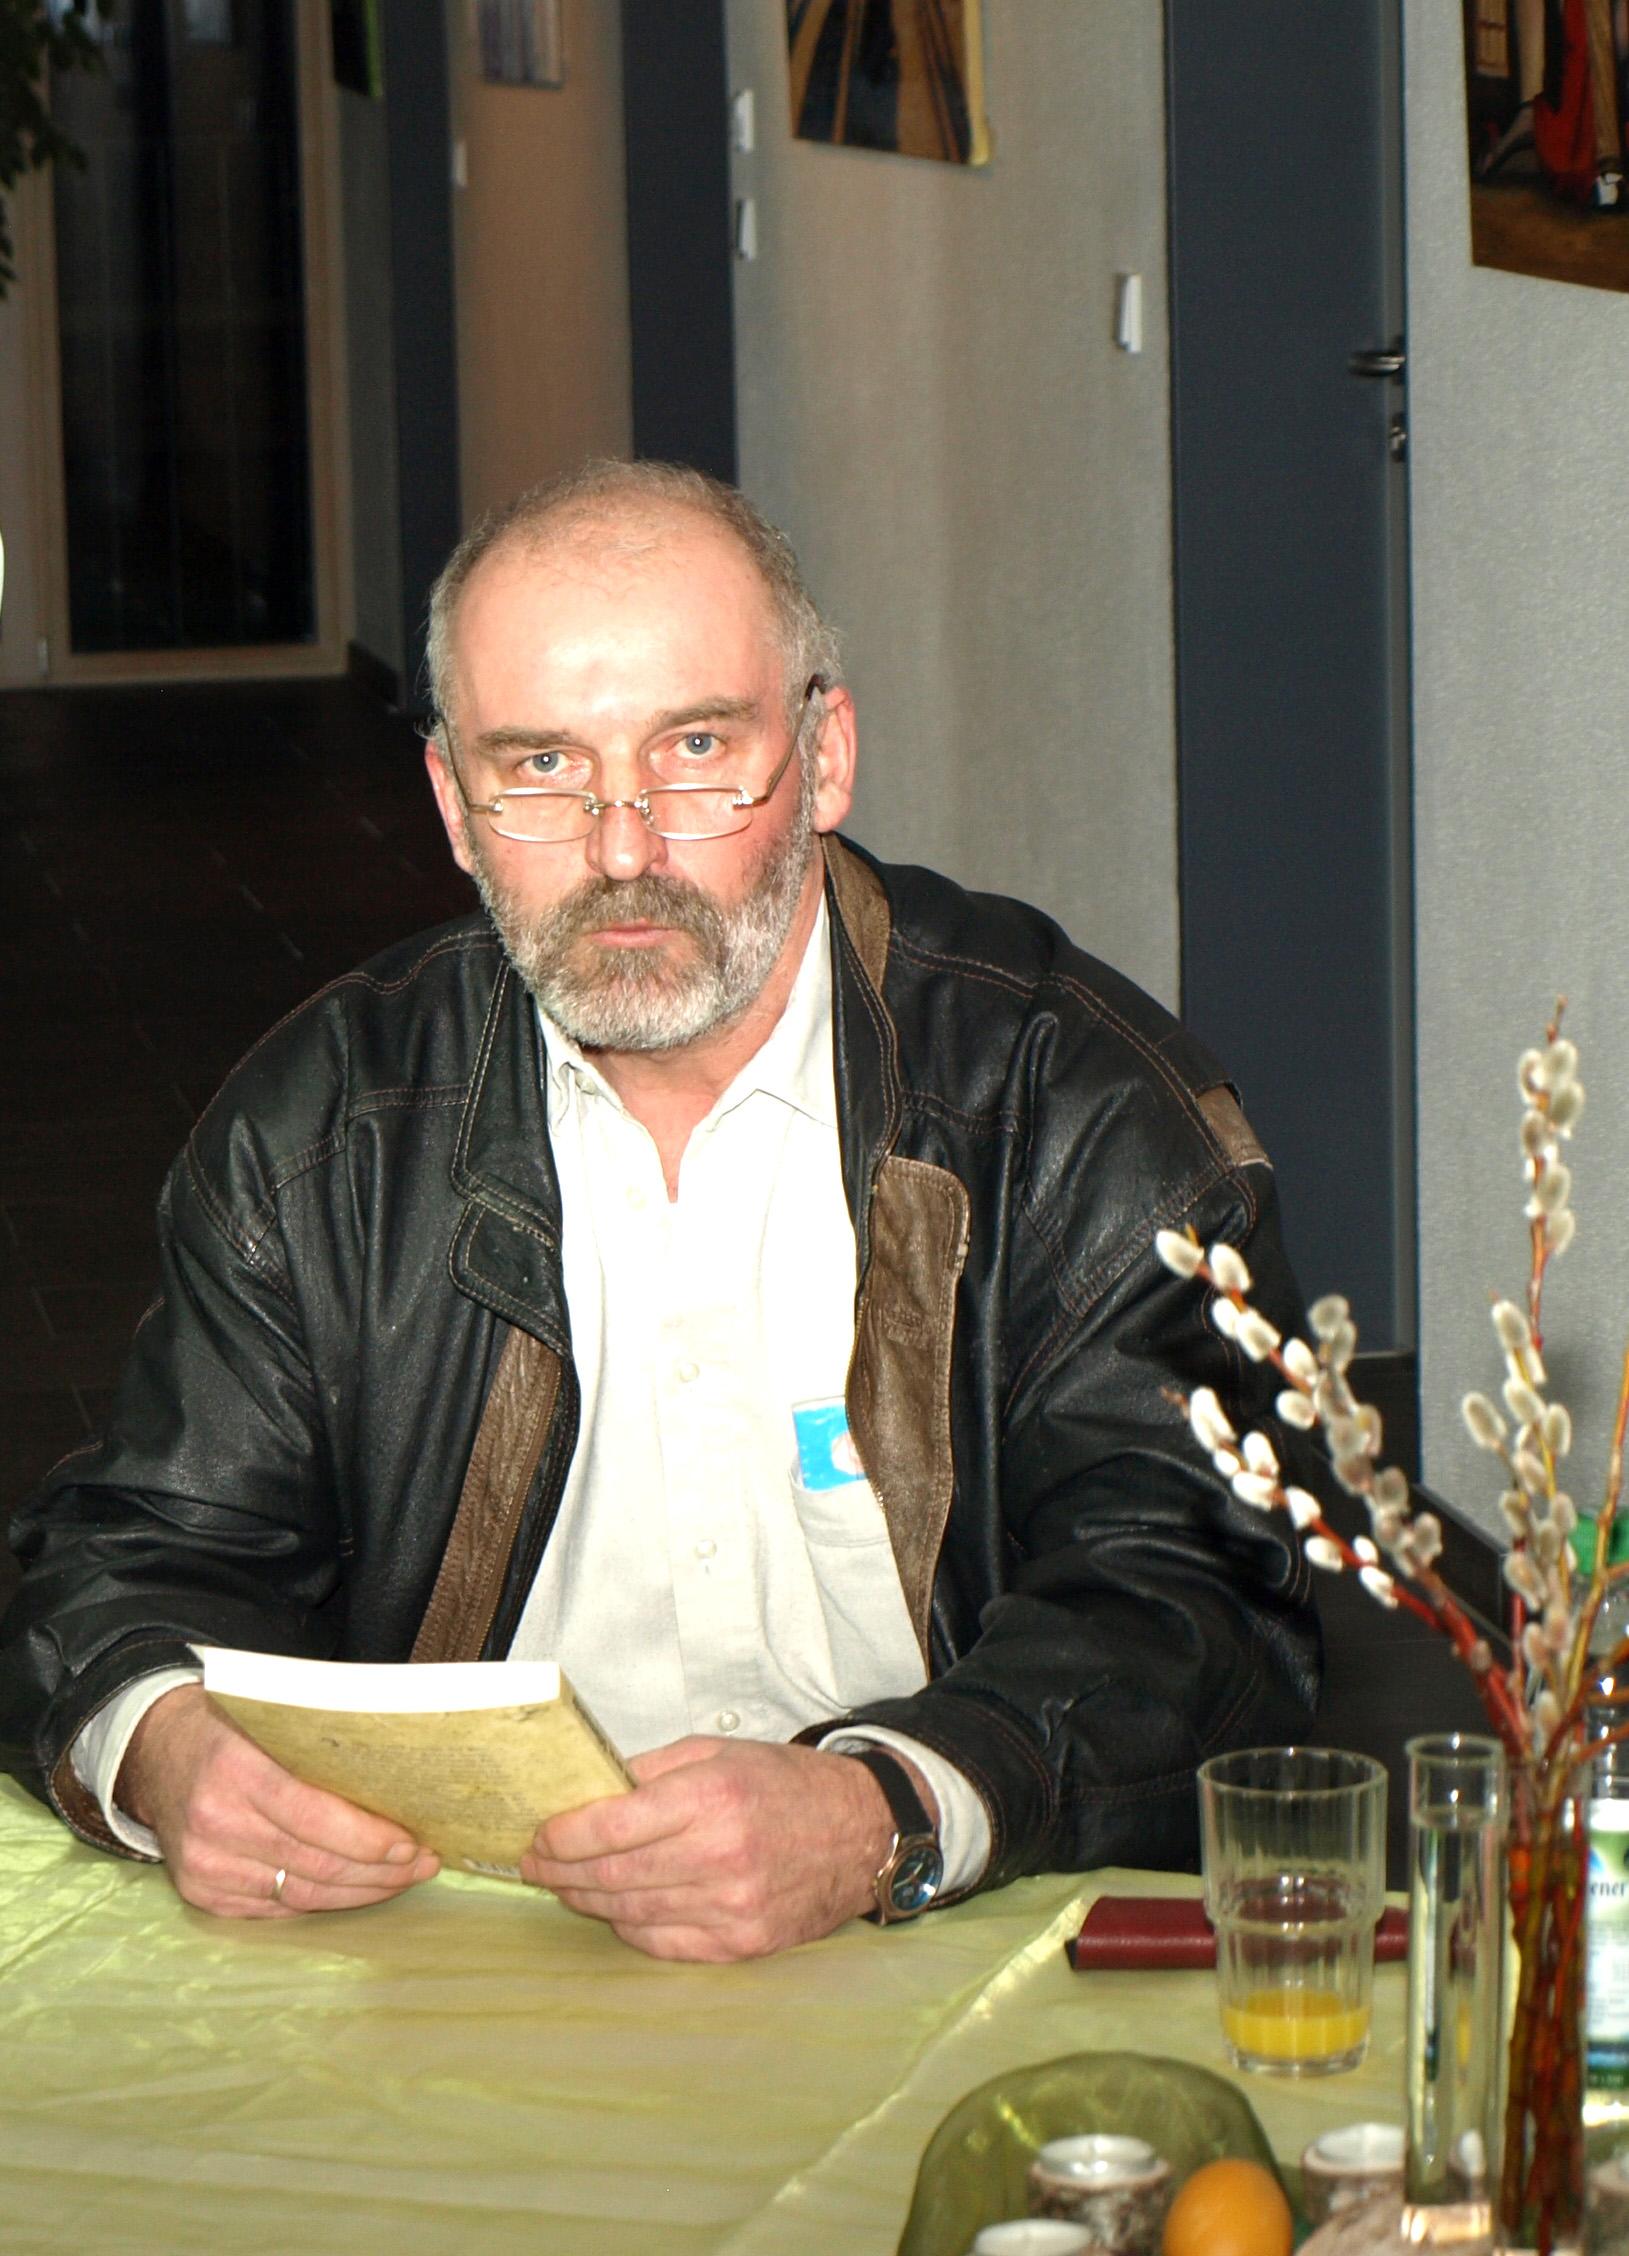 Josef Fischer